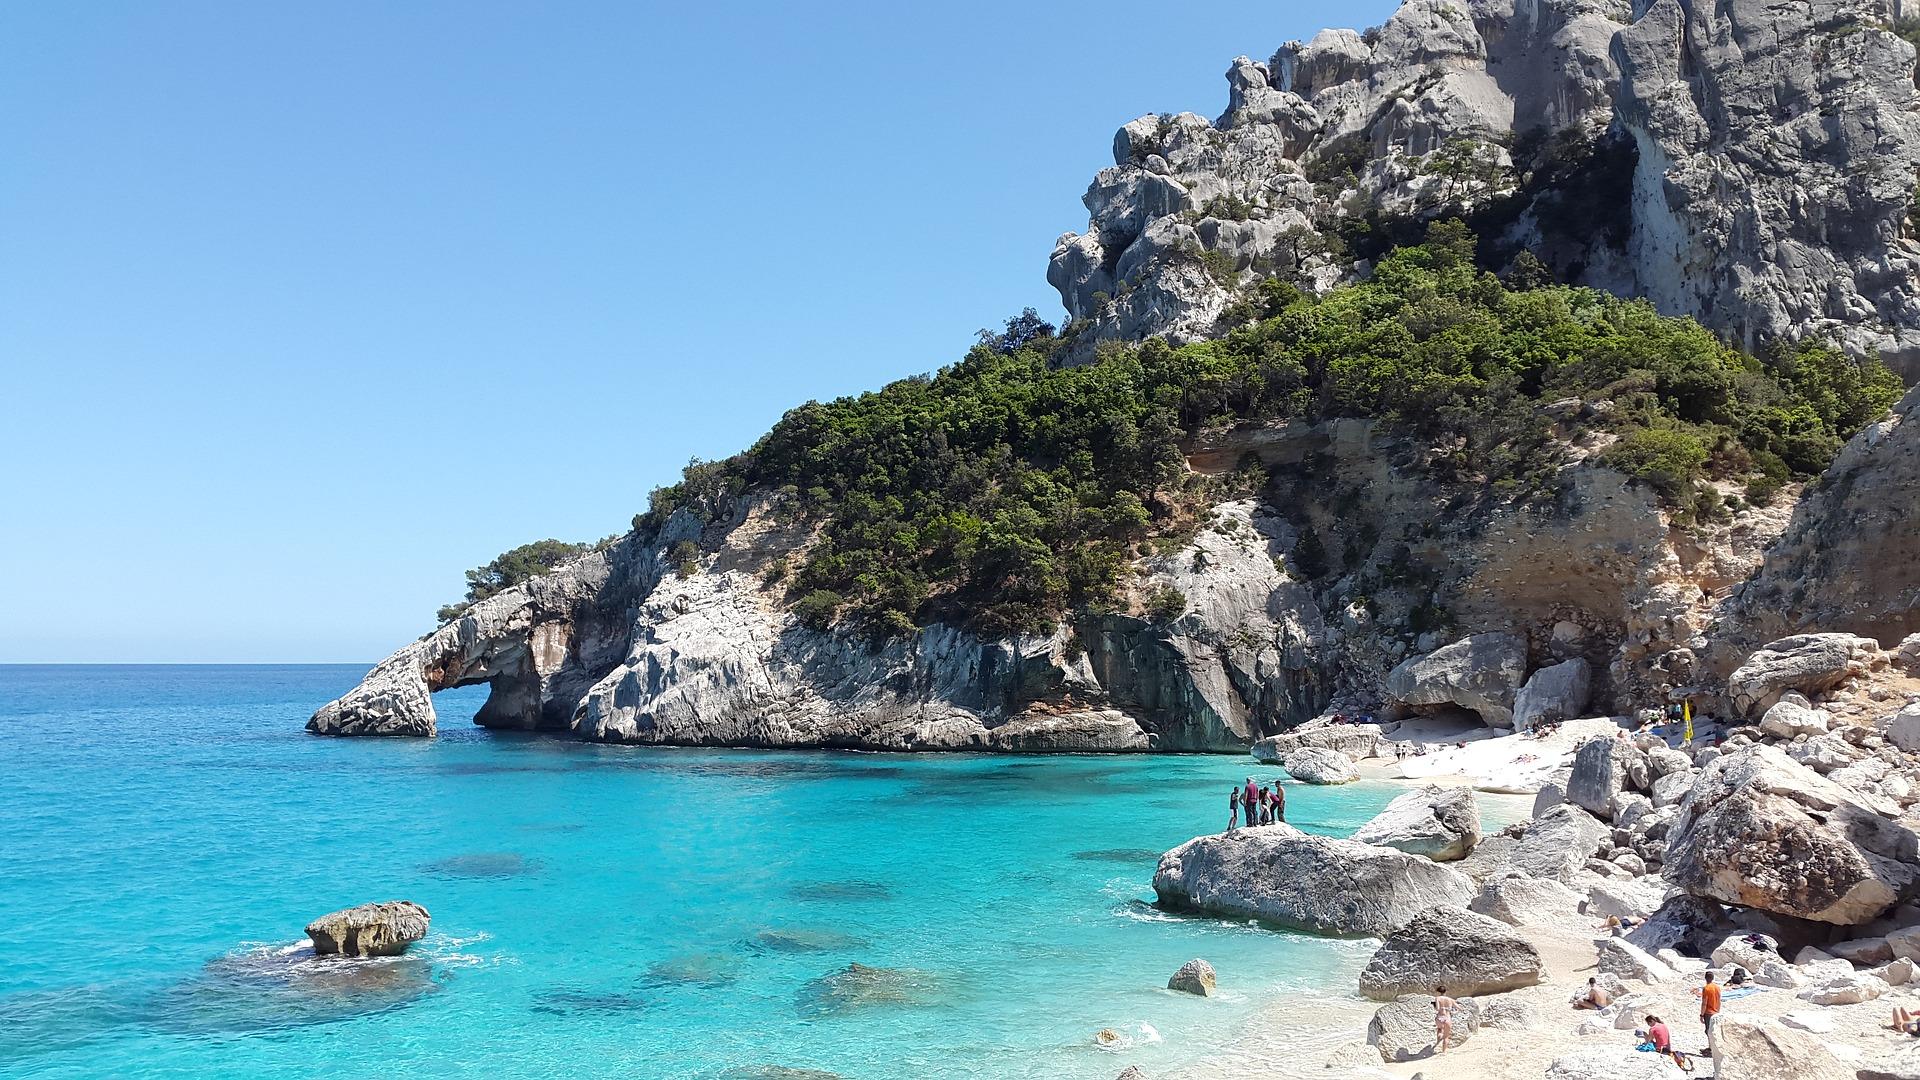 Cala Goloritze mein lieblingsort auf Sardinien